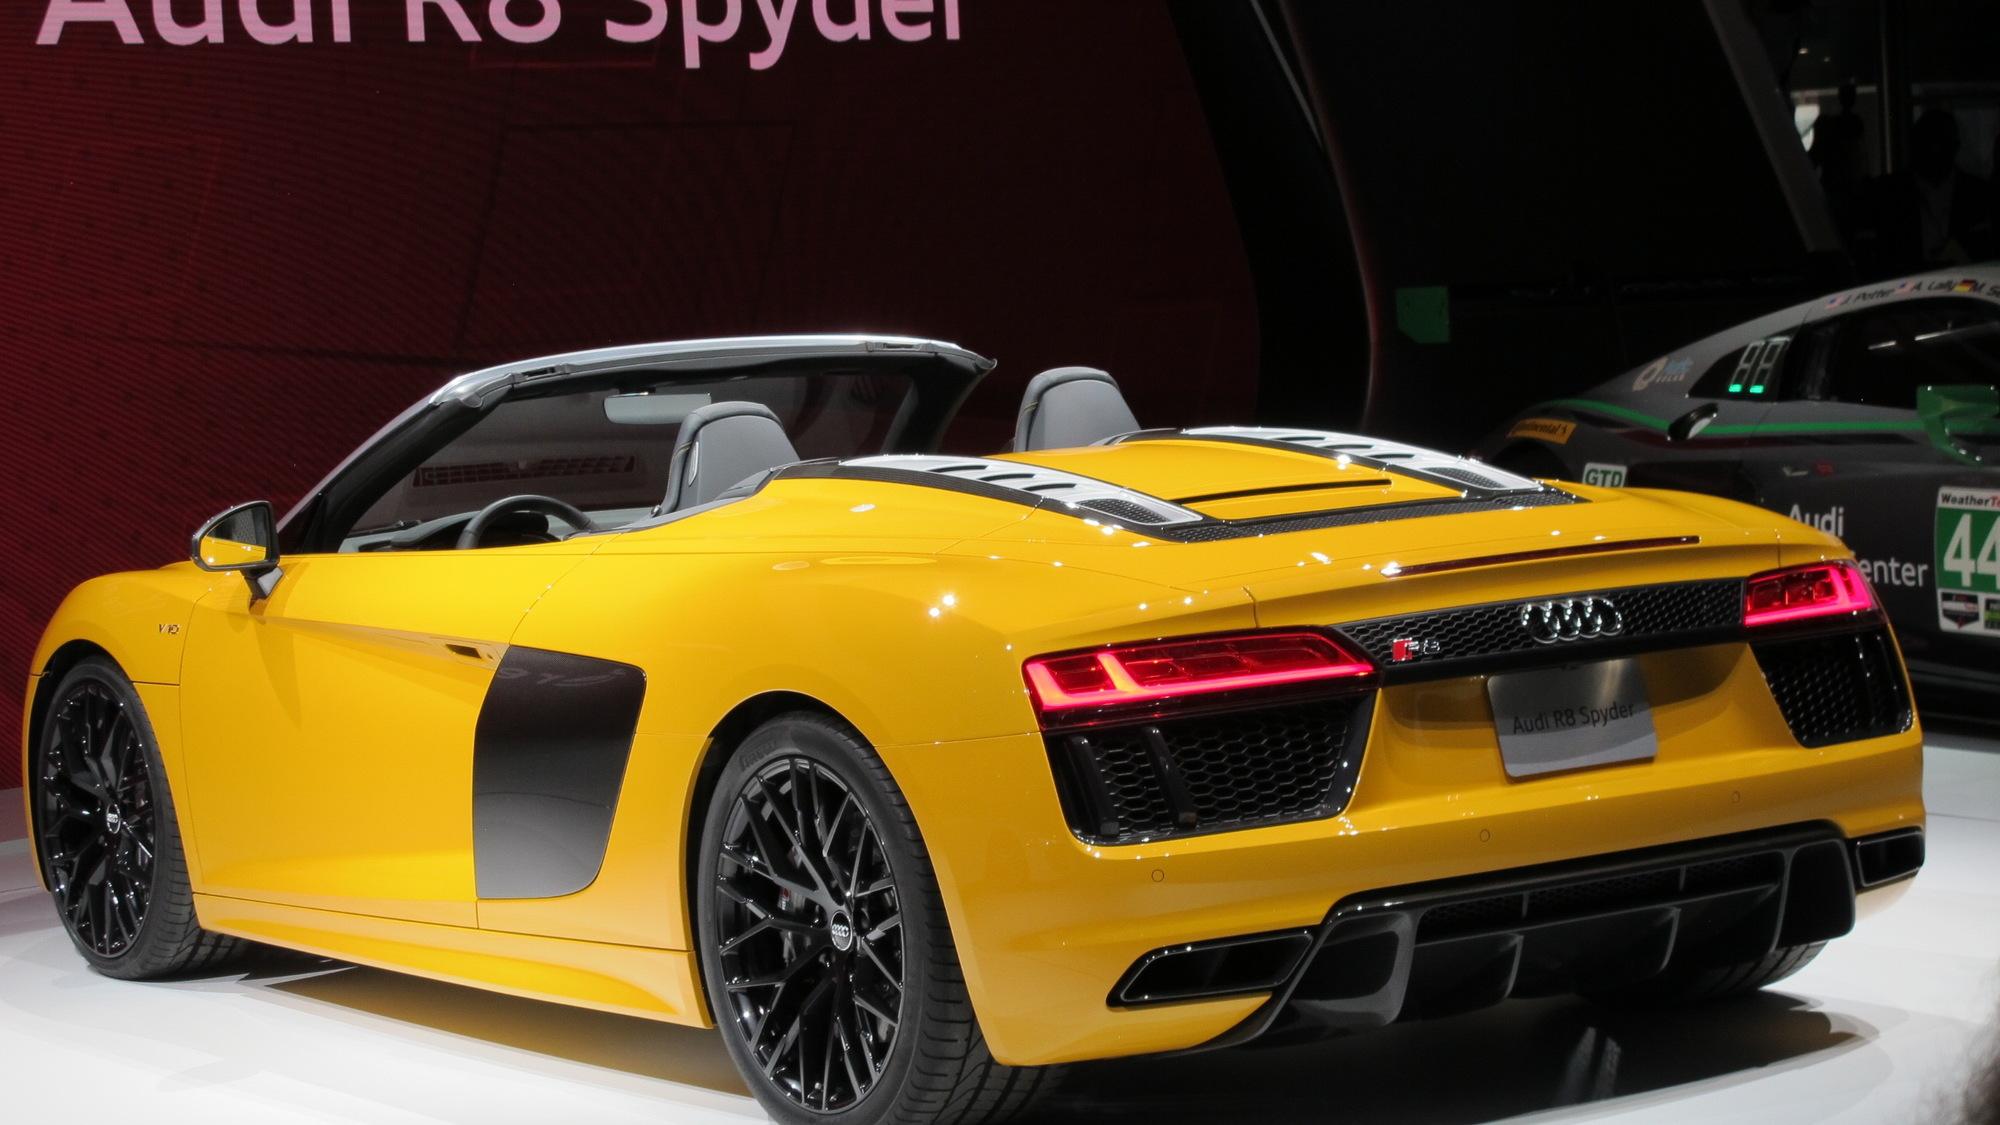 2017 Audi R8 V10 Spyder, 2016 New York auto show